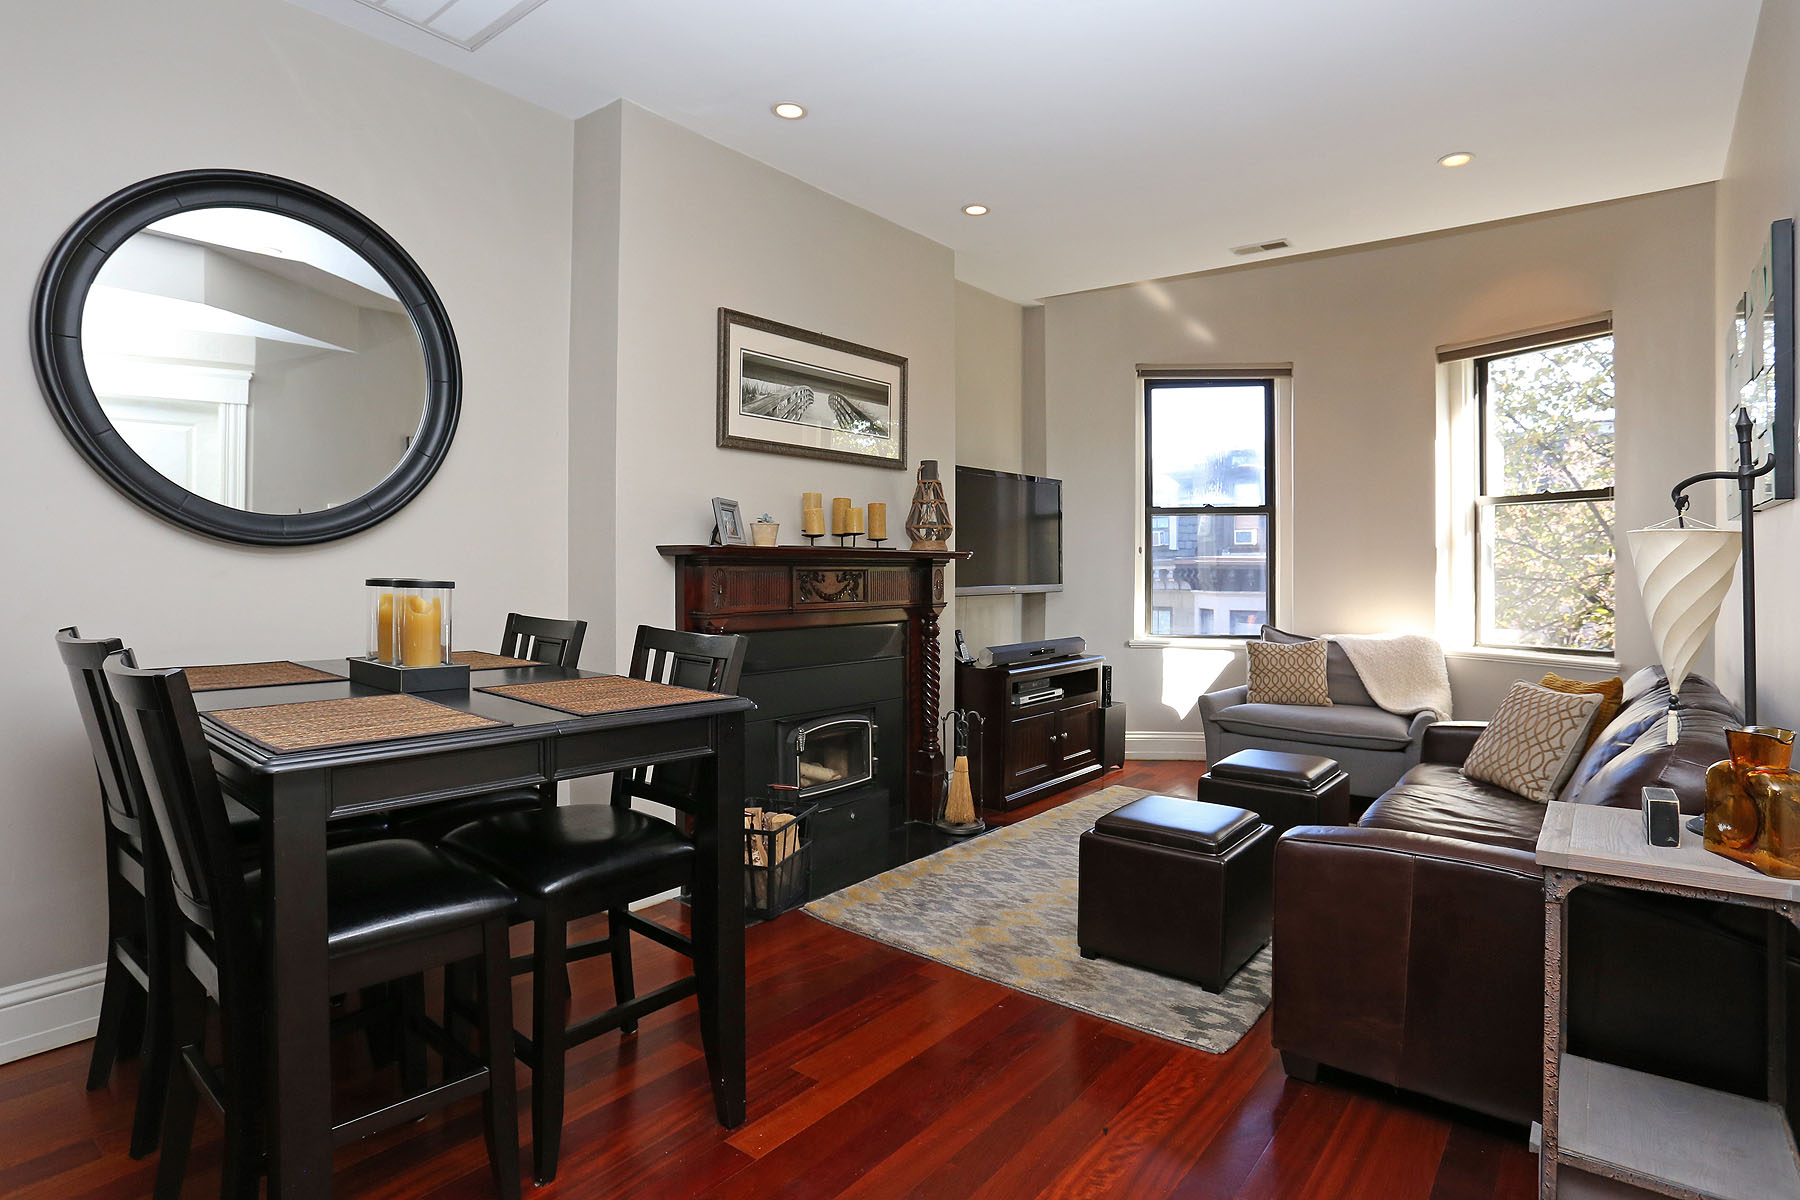 Condomínio para Venda às South End Condominium 146 Worcester Street Unit 4 South End, Boston, Massachusetts 02118 Estados Unidos